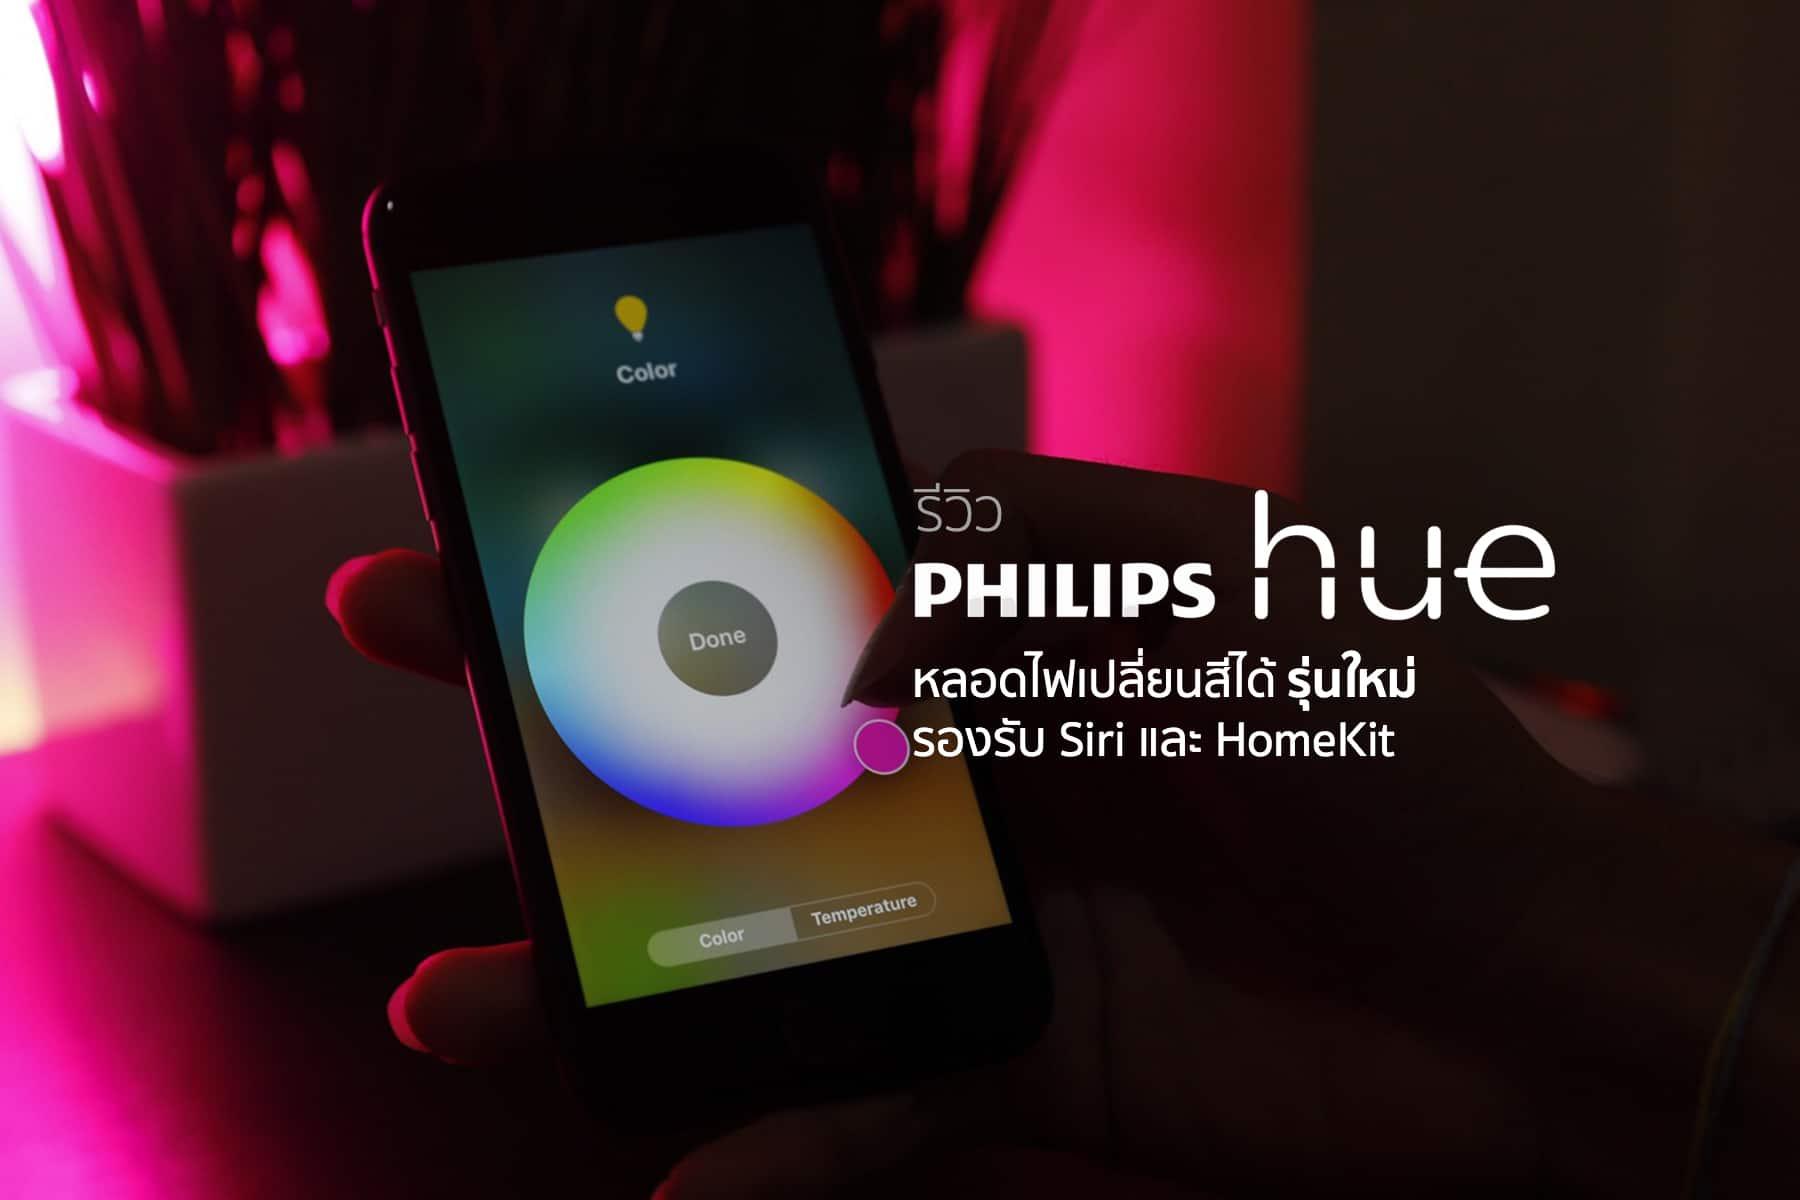 phillip-hue-review-macthai-cover